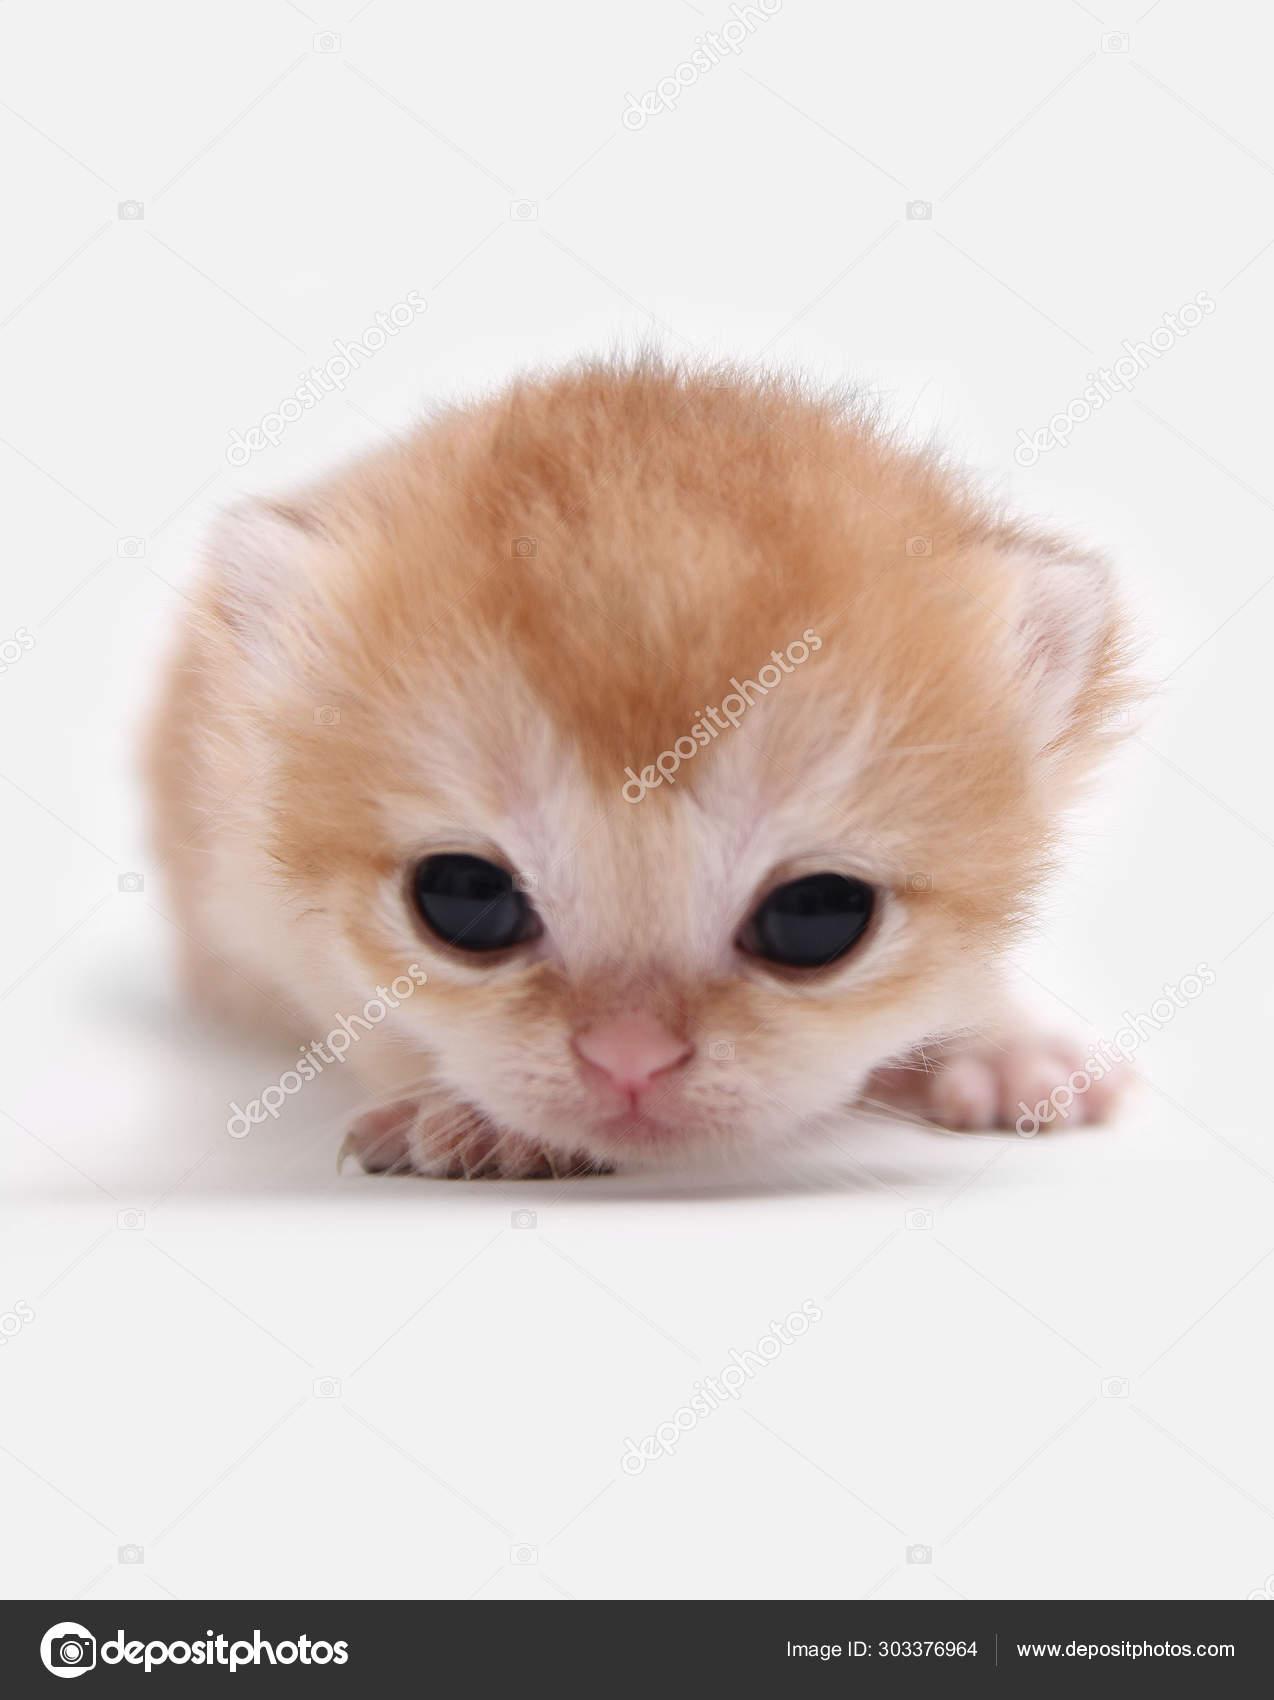 British Shorthair Bri Black Golden Shaded Kitten White Background Stock Photo C Mirencats 303376964